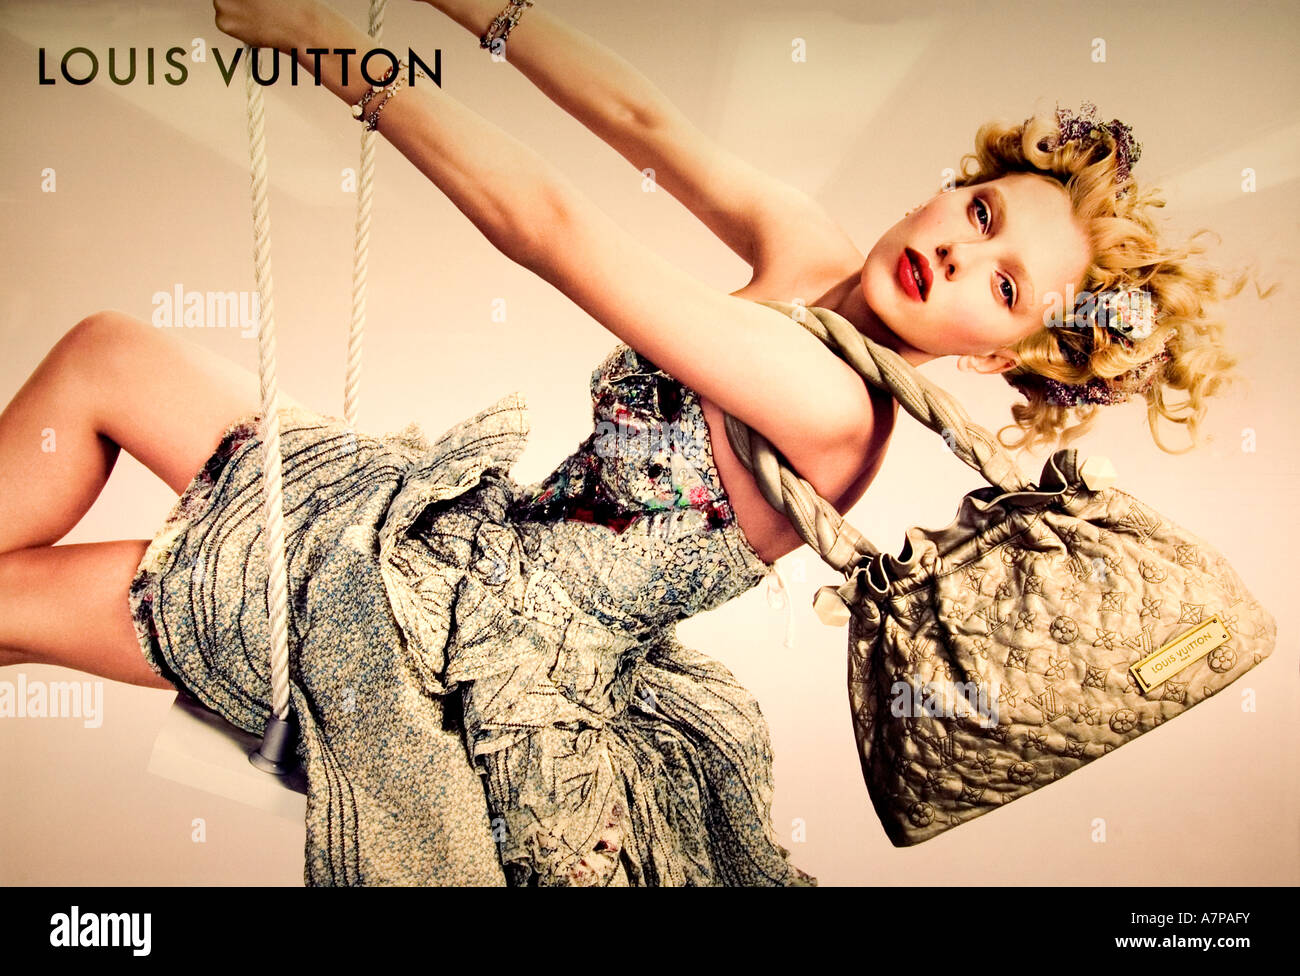 Tokyo Louis Vuitton Tokyo Fashion House Model Plate Sheet - Stock Image